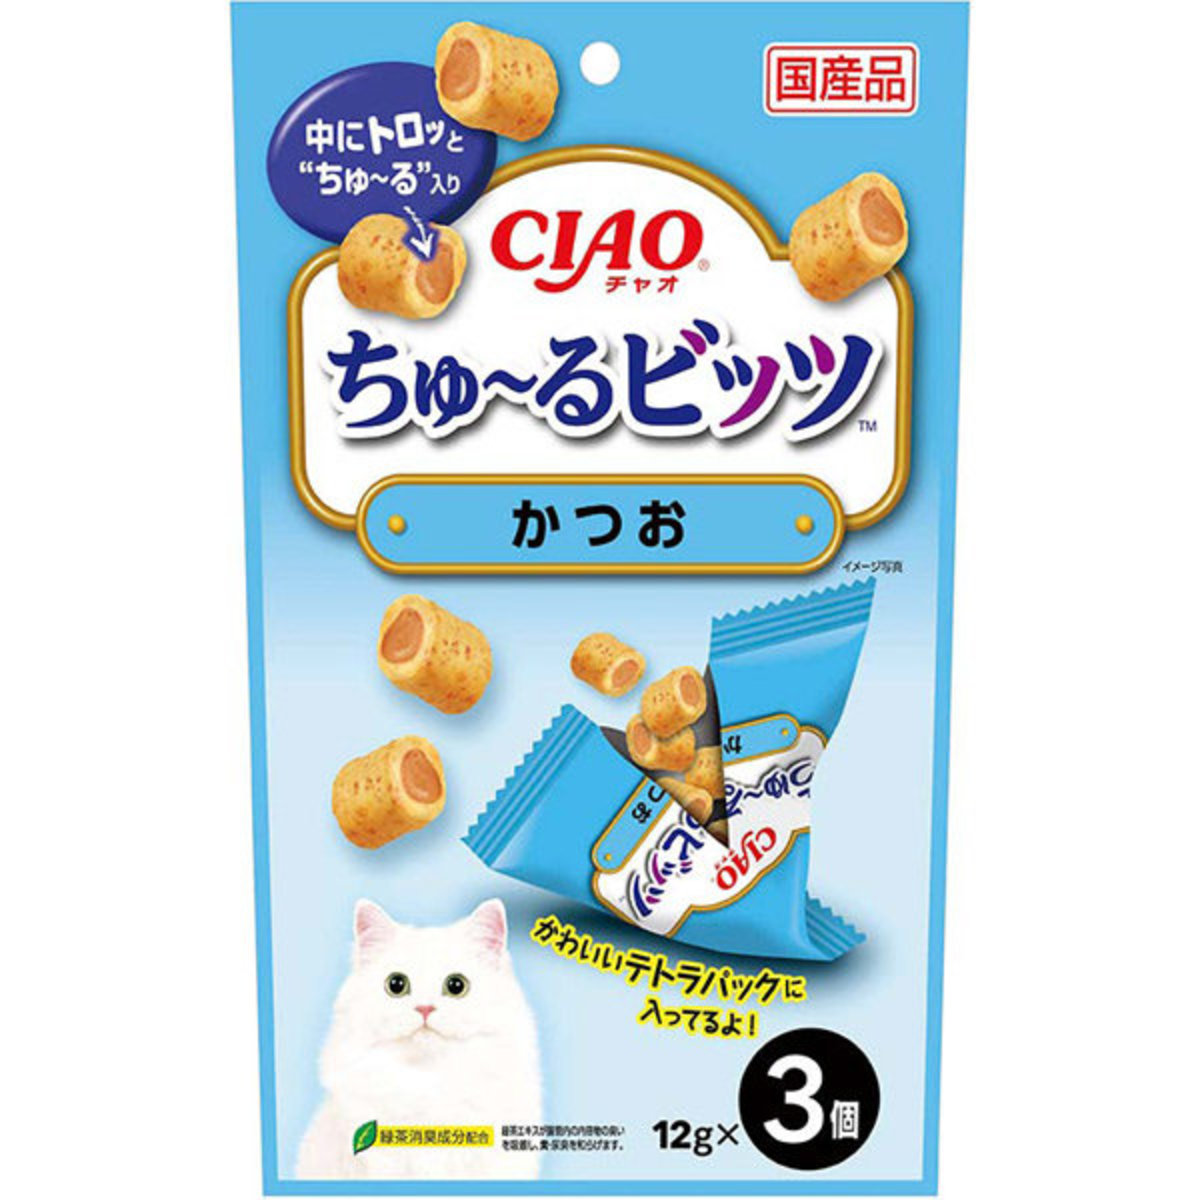 CIAO Churubi - Skipjack Flavour (3pcs) #CS-173